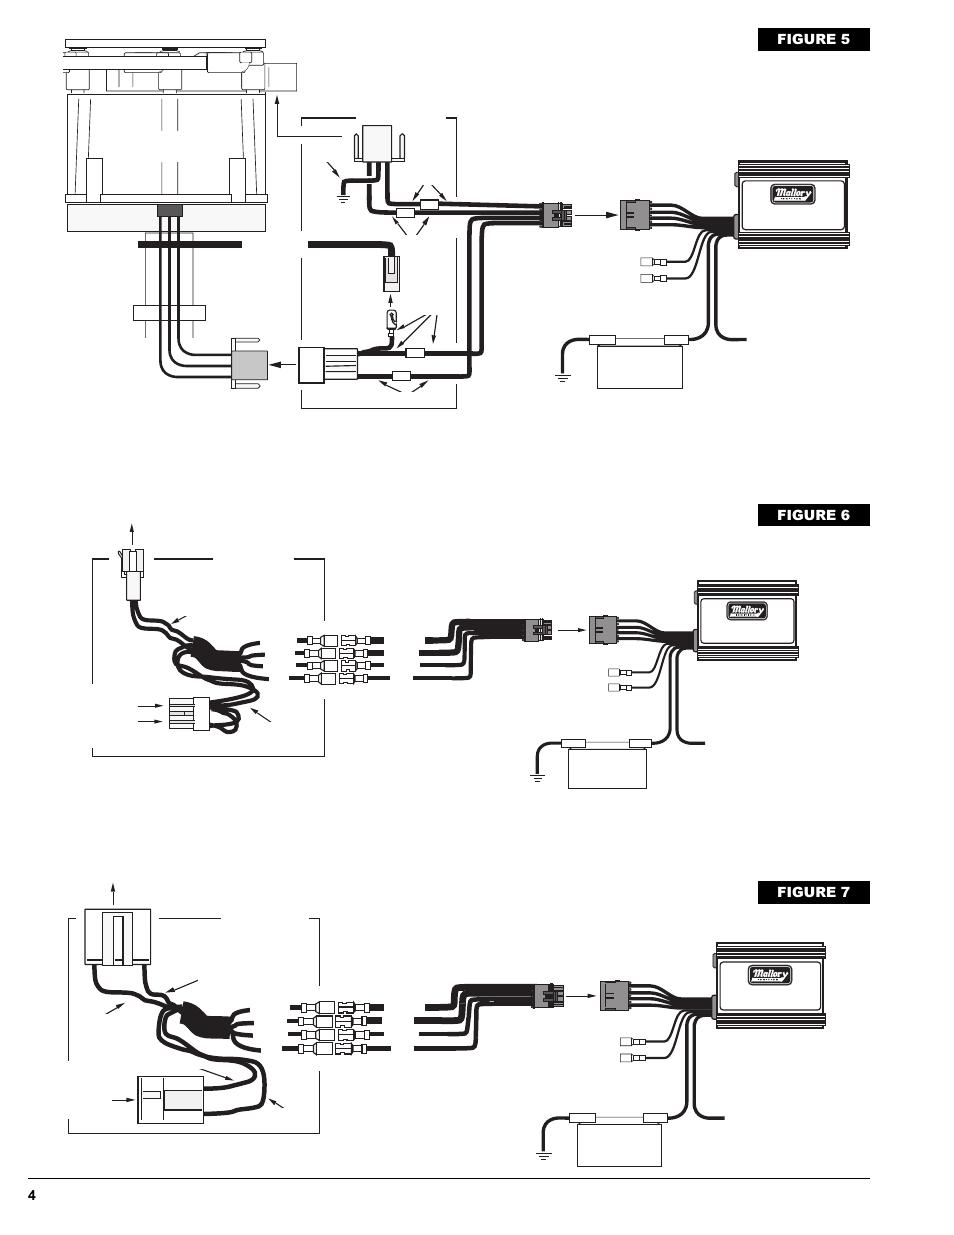 Wiring High Fire Mallory Edi Diagram on